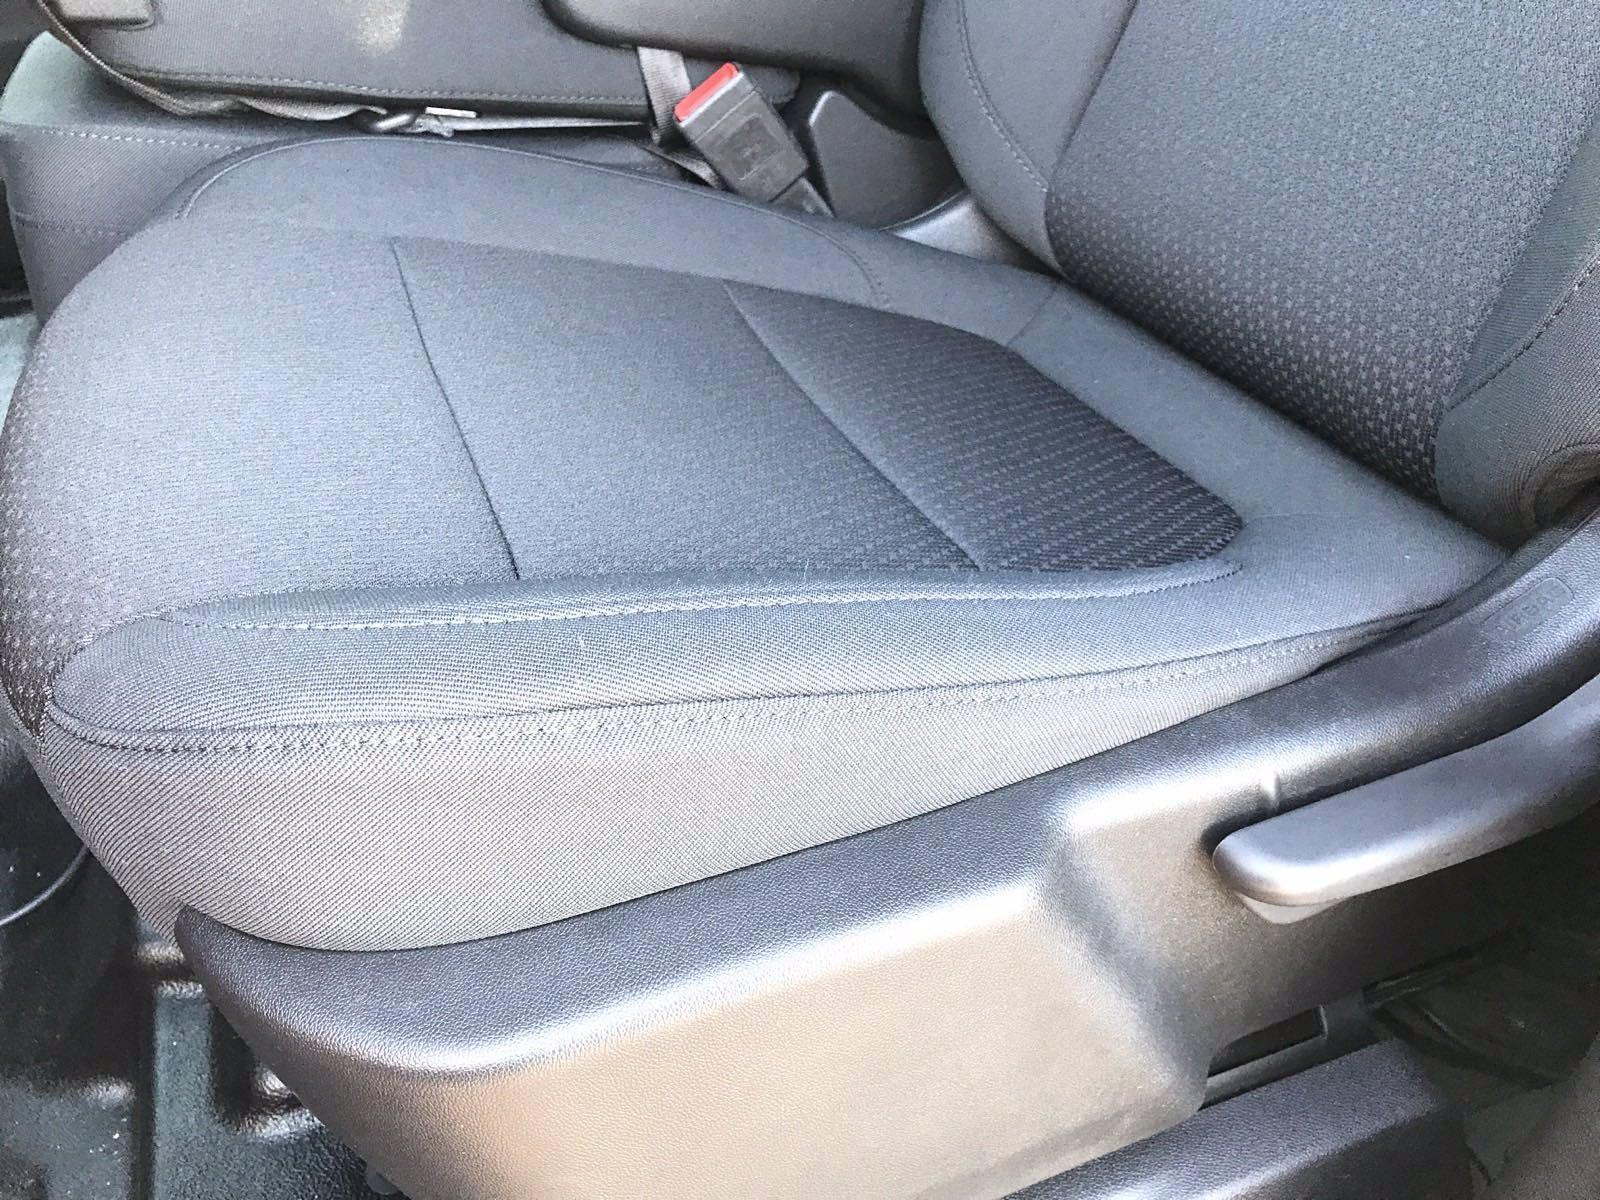 2020 Chevrolet Silverado 3500 Crew Cab DRW 4x2, Knapheide Drop Side Dump Body #B27694 - photo 15